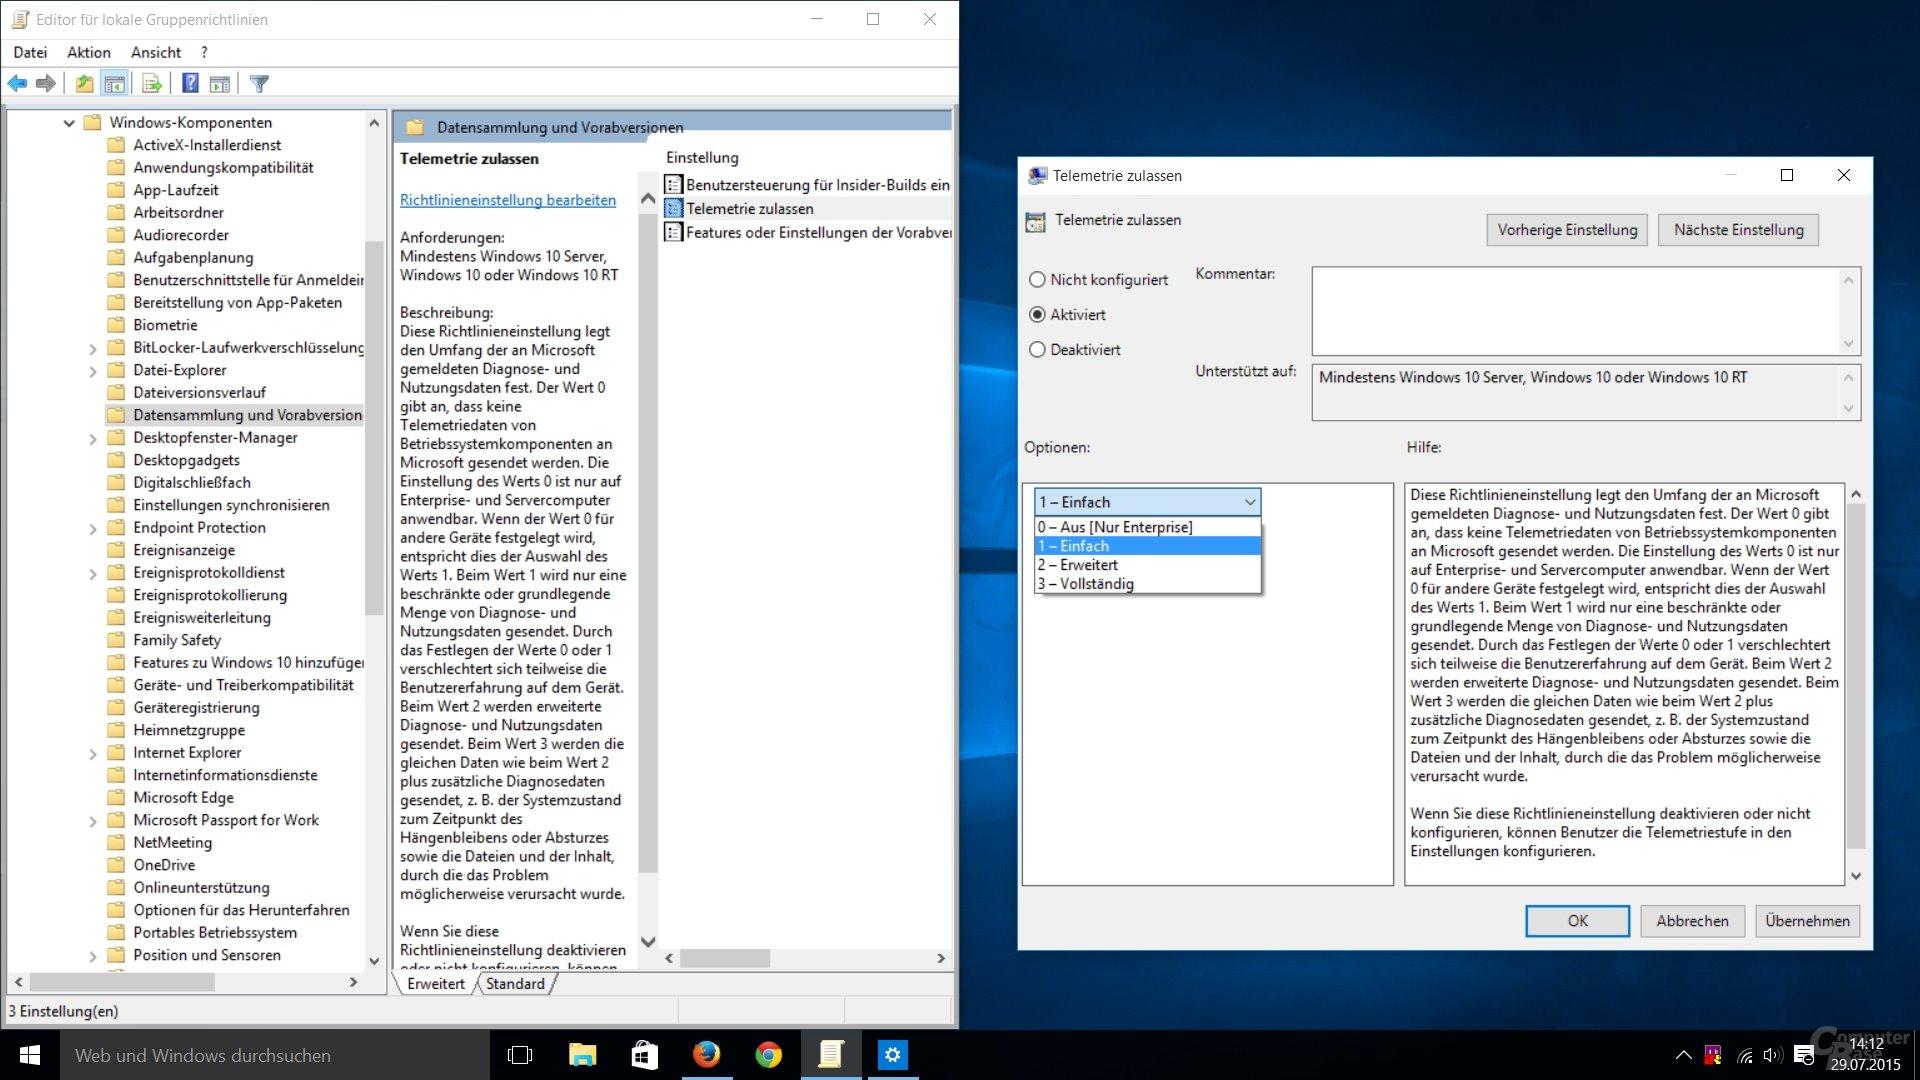 Windows 10: Telemetrie zulassen